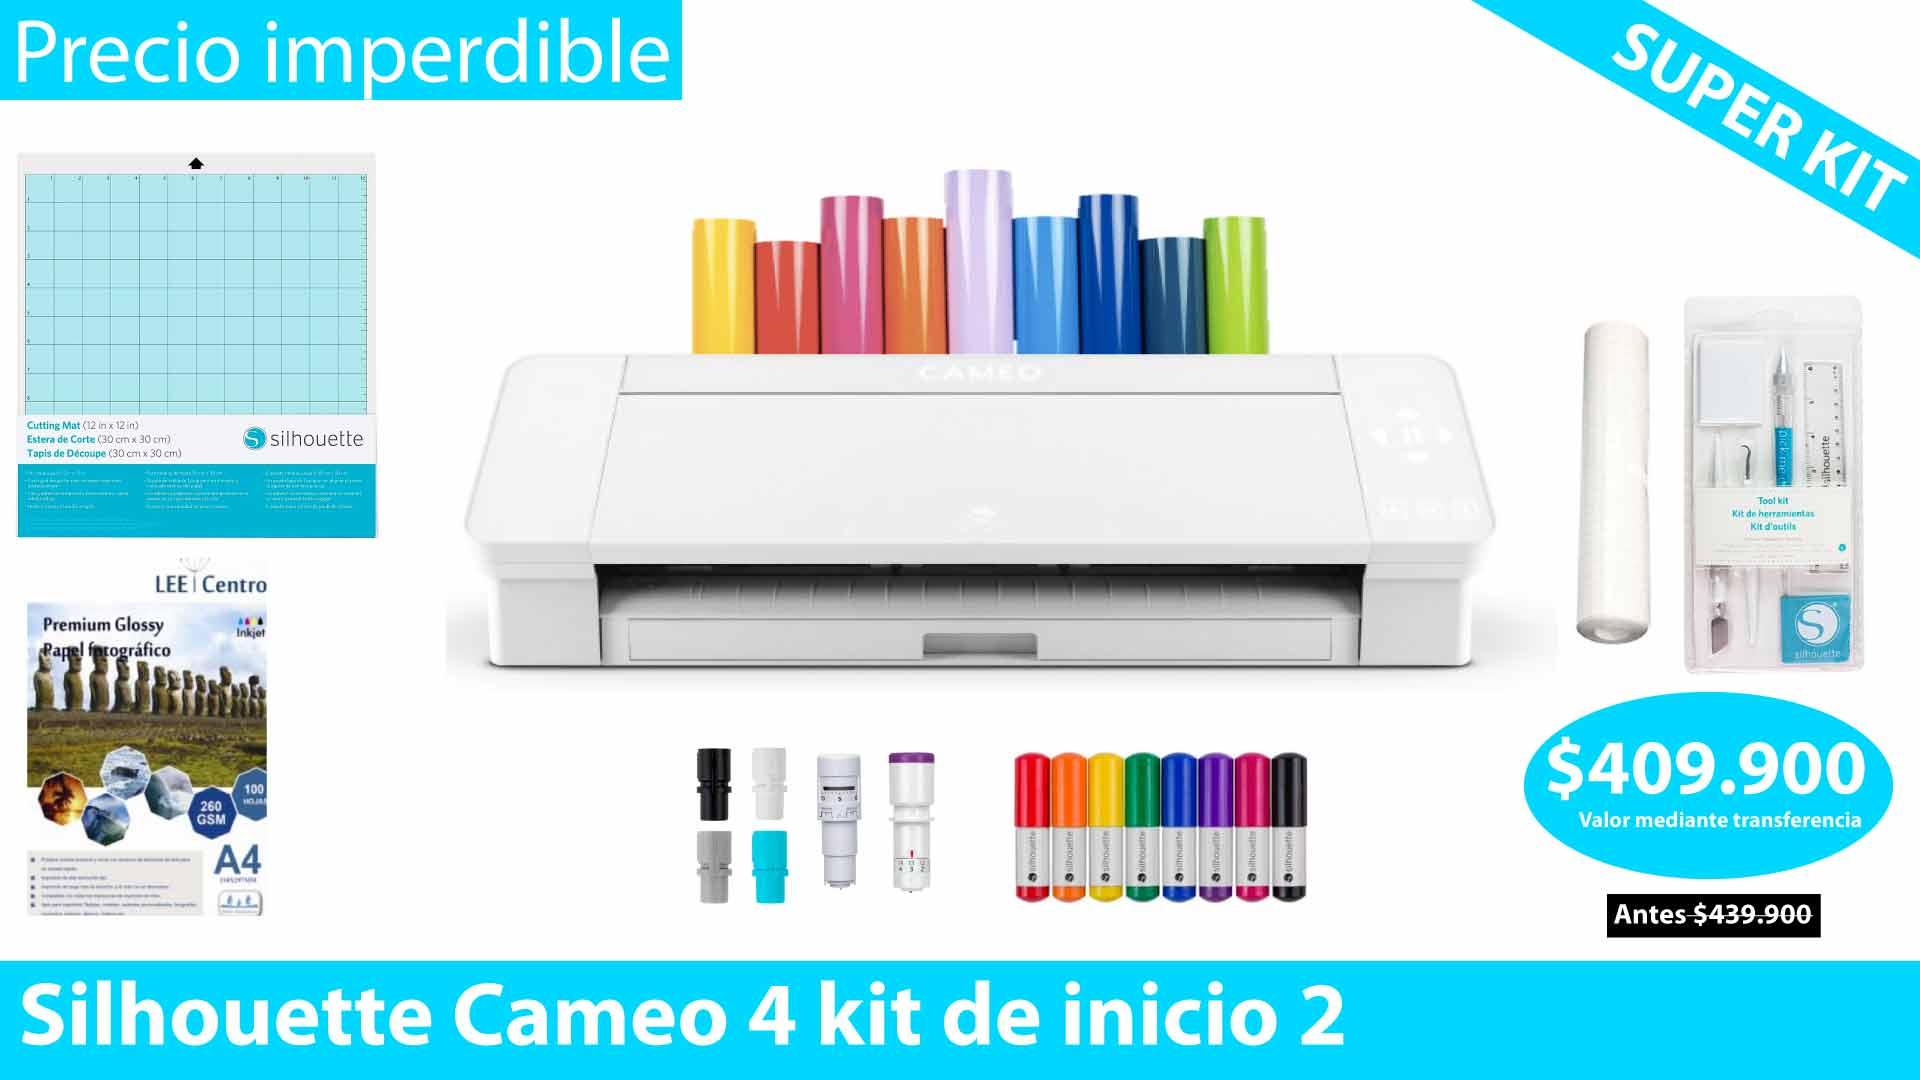 Silhouette Cameo 4 kit de inicio 2 OFERTA